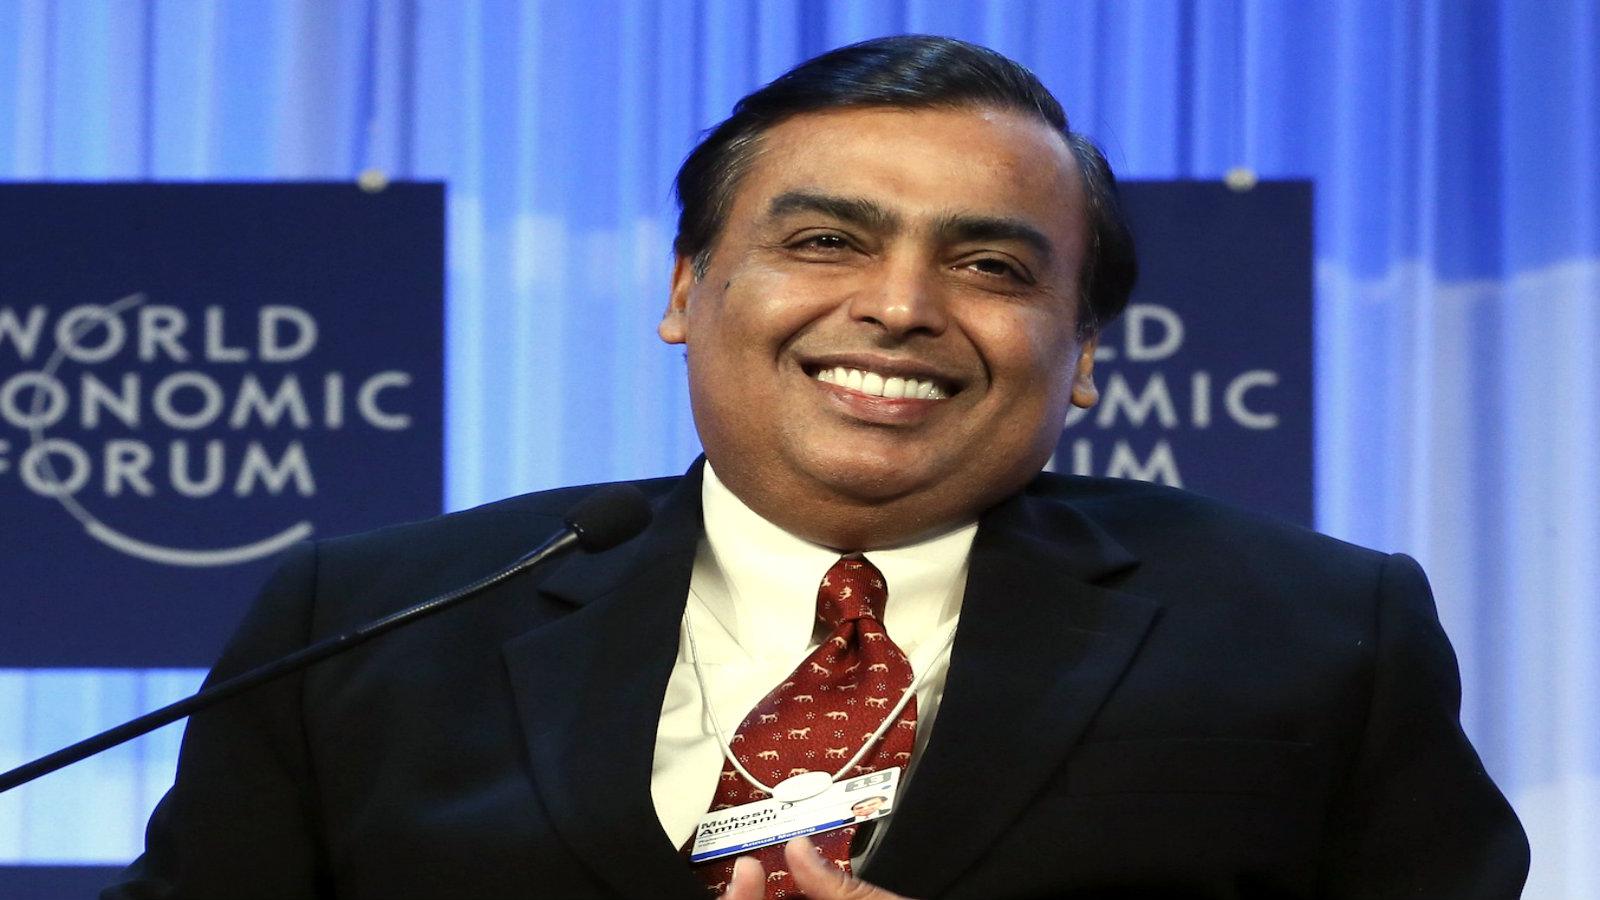 Billionaire Mukesh Ambani richest Indian for ninth year: Forbes